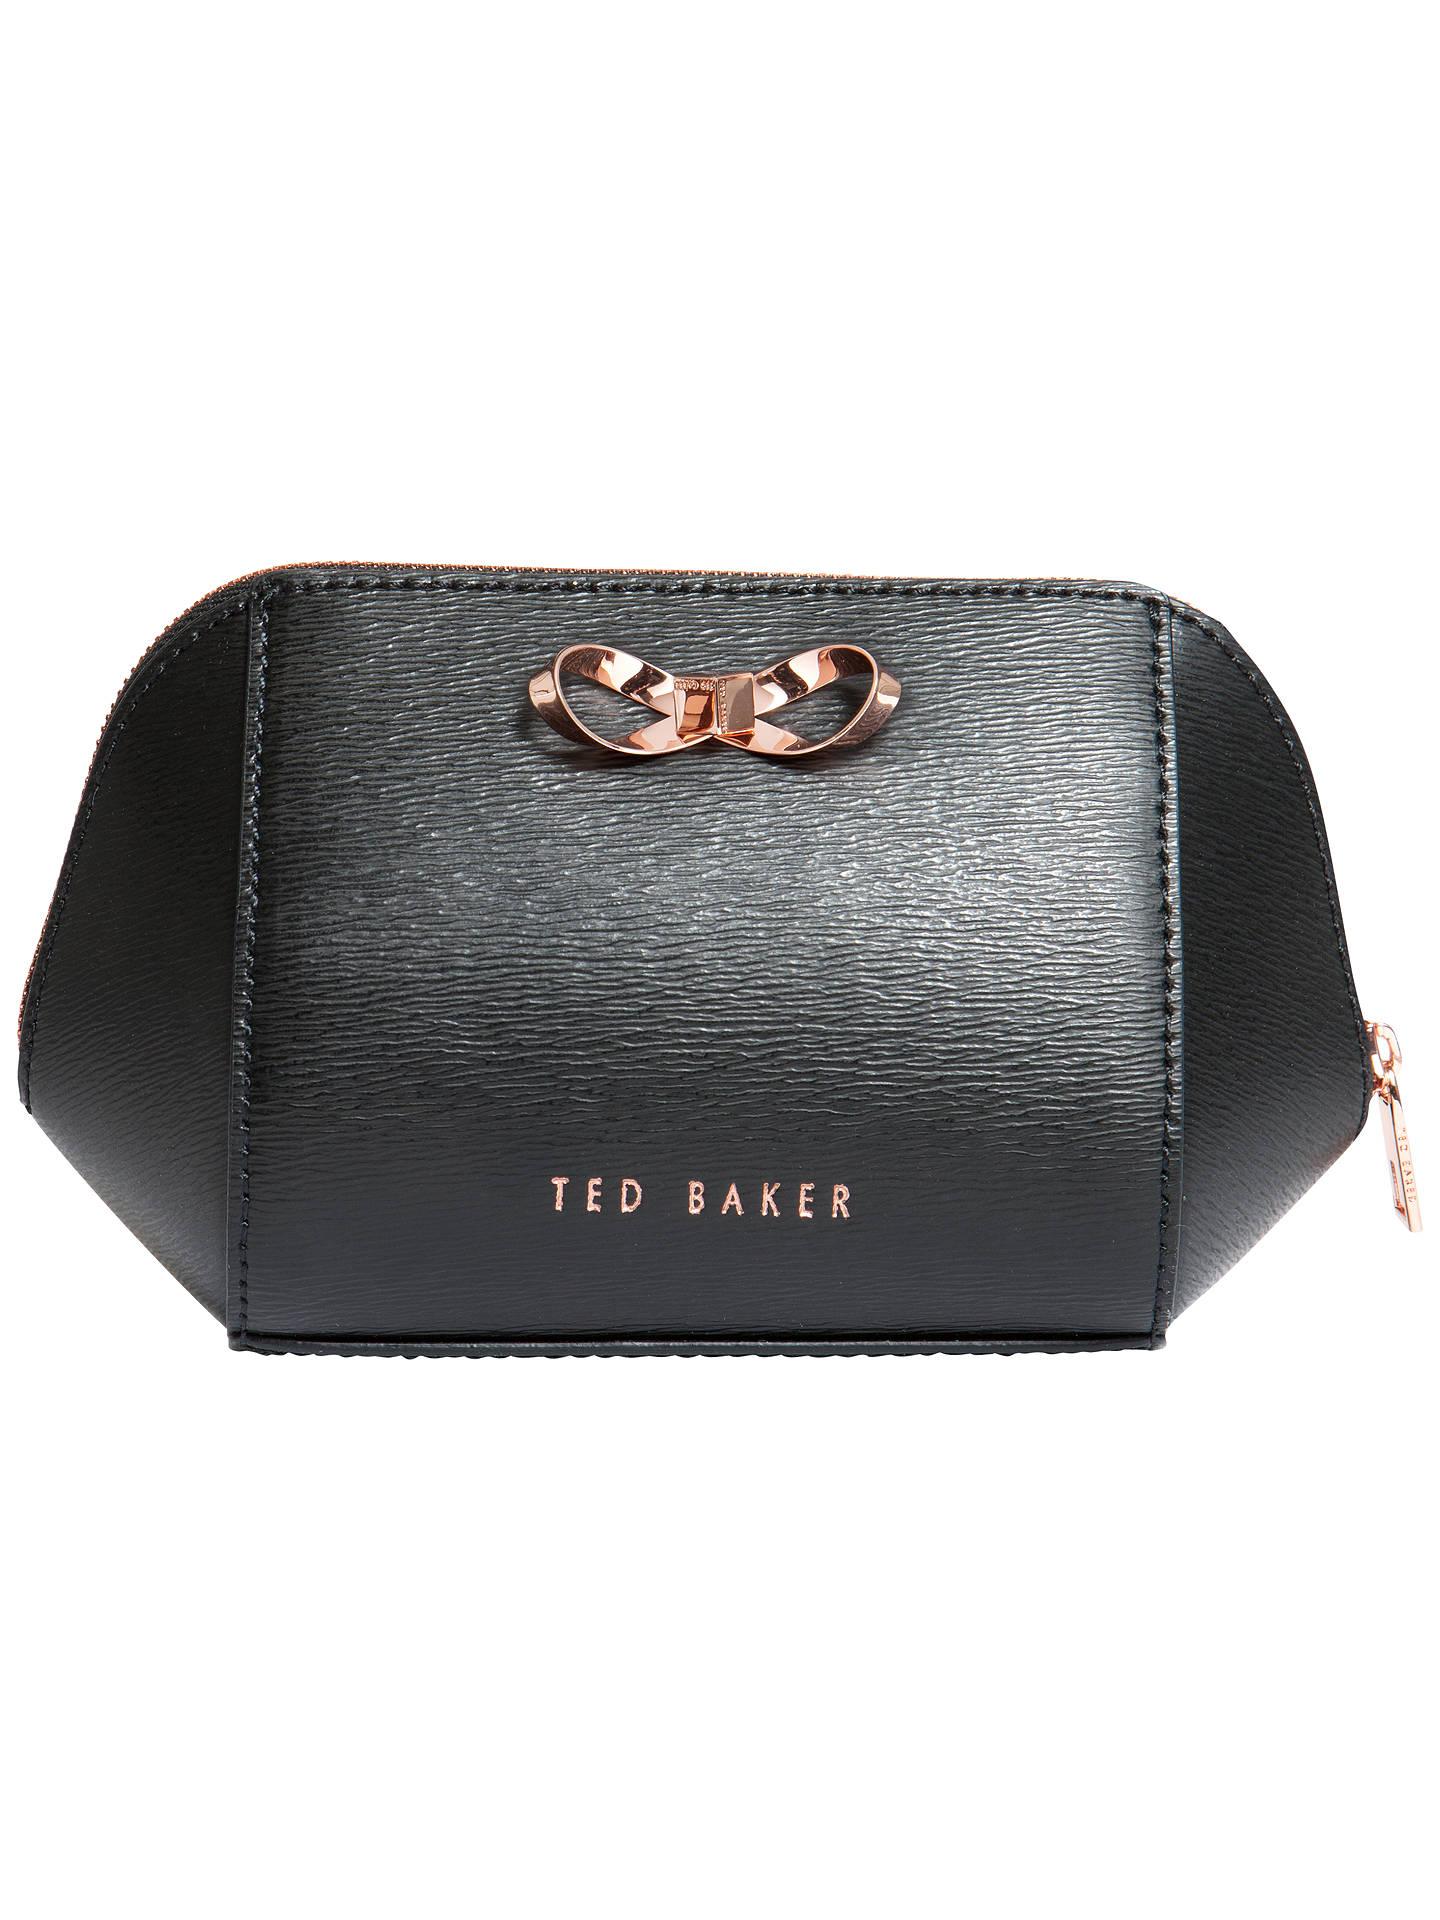 cdfc00747b4 Buy Ted Baker Ammi Bow Leather Makeup Bag, Black Online at johnlewis.com ...